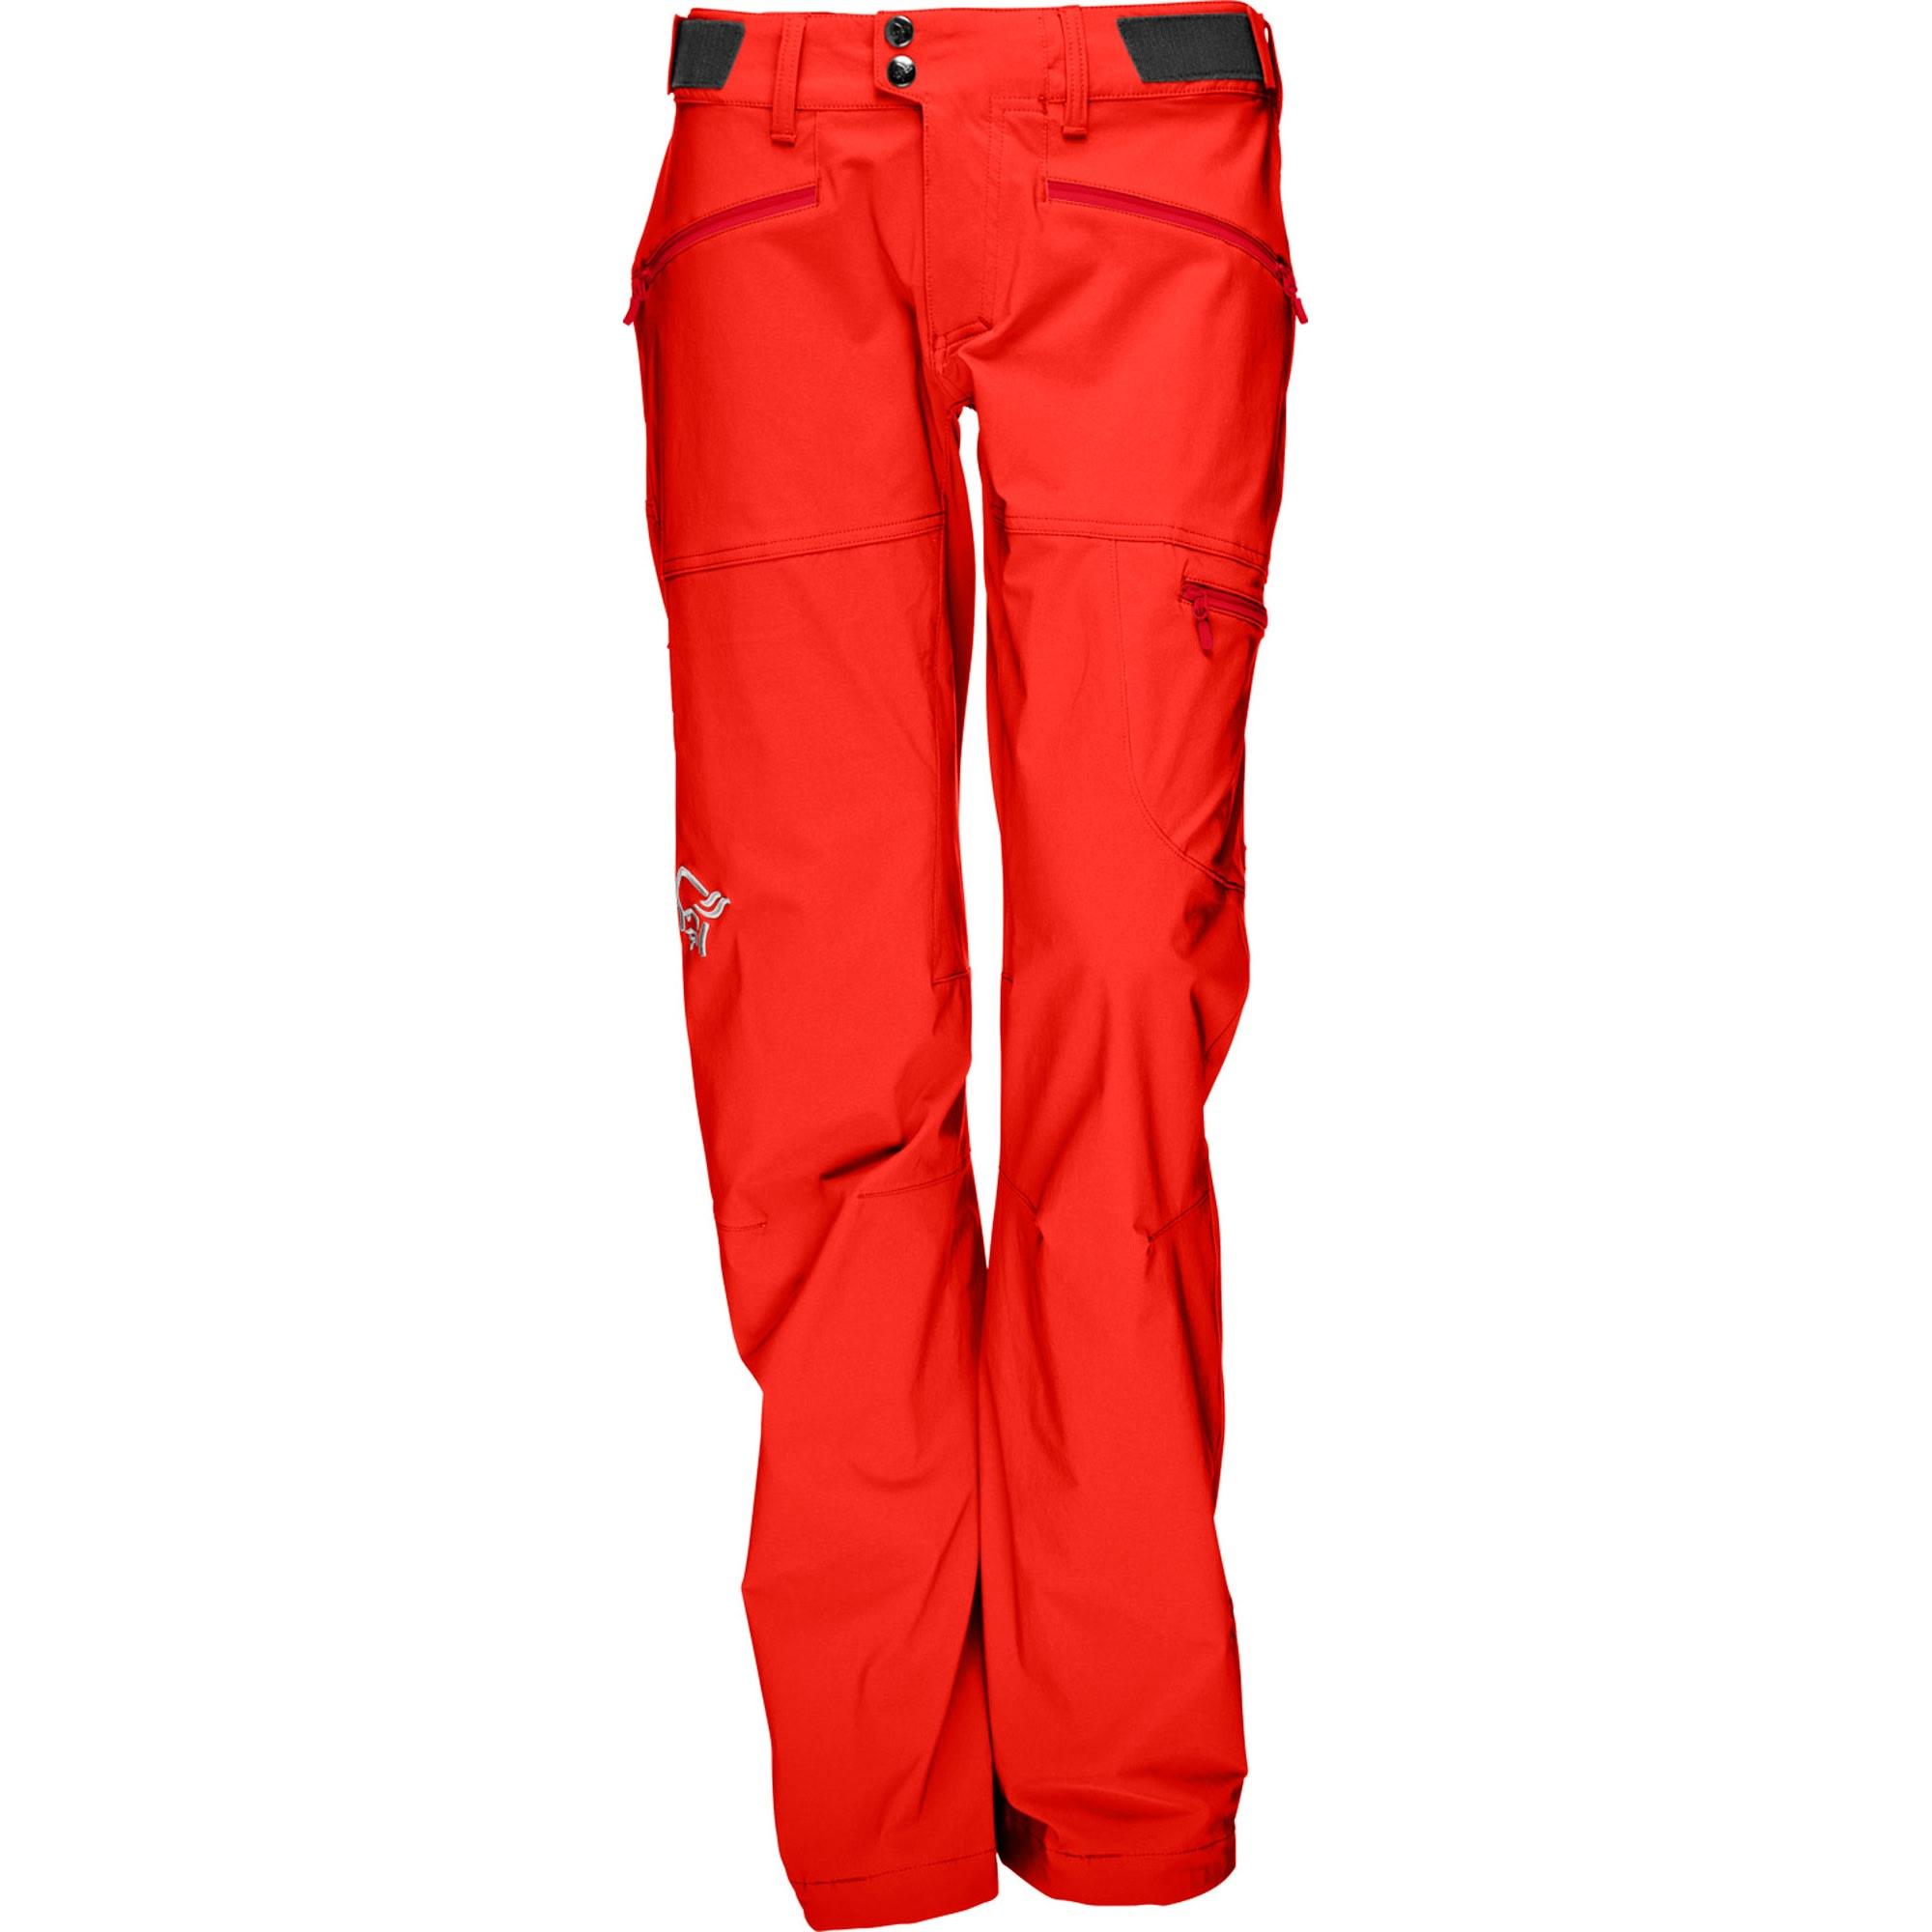 Kjøp Norrøna Svalbard Flex1 Pants Women fra Outnorth